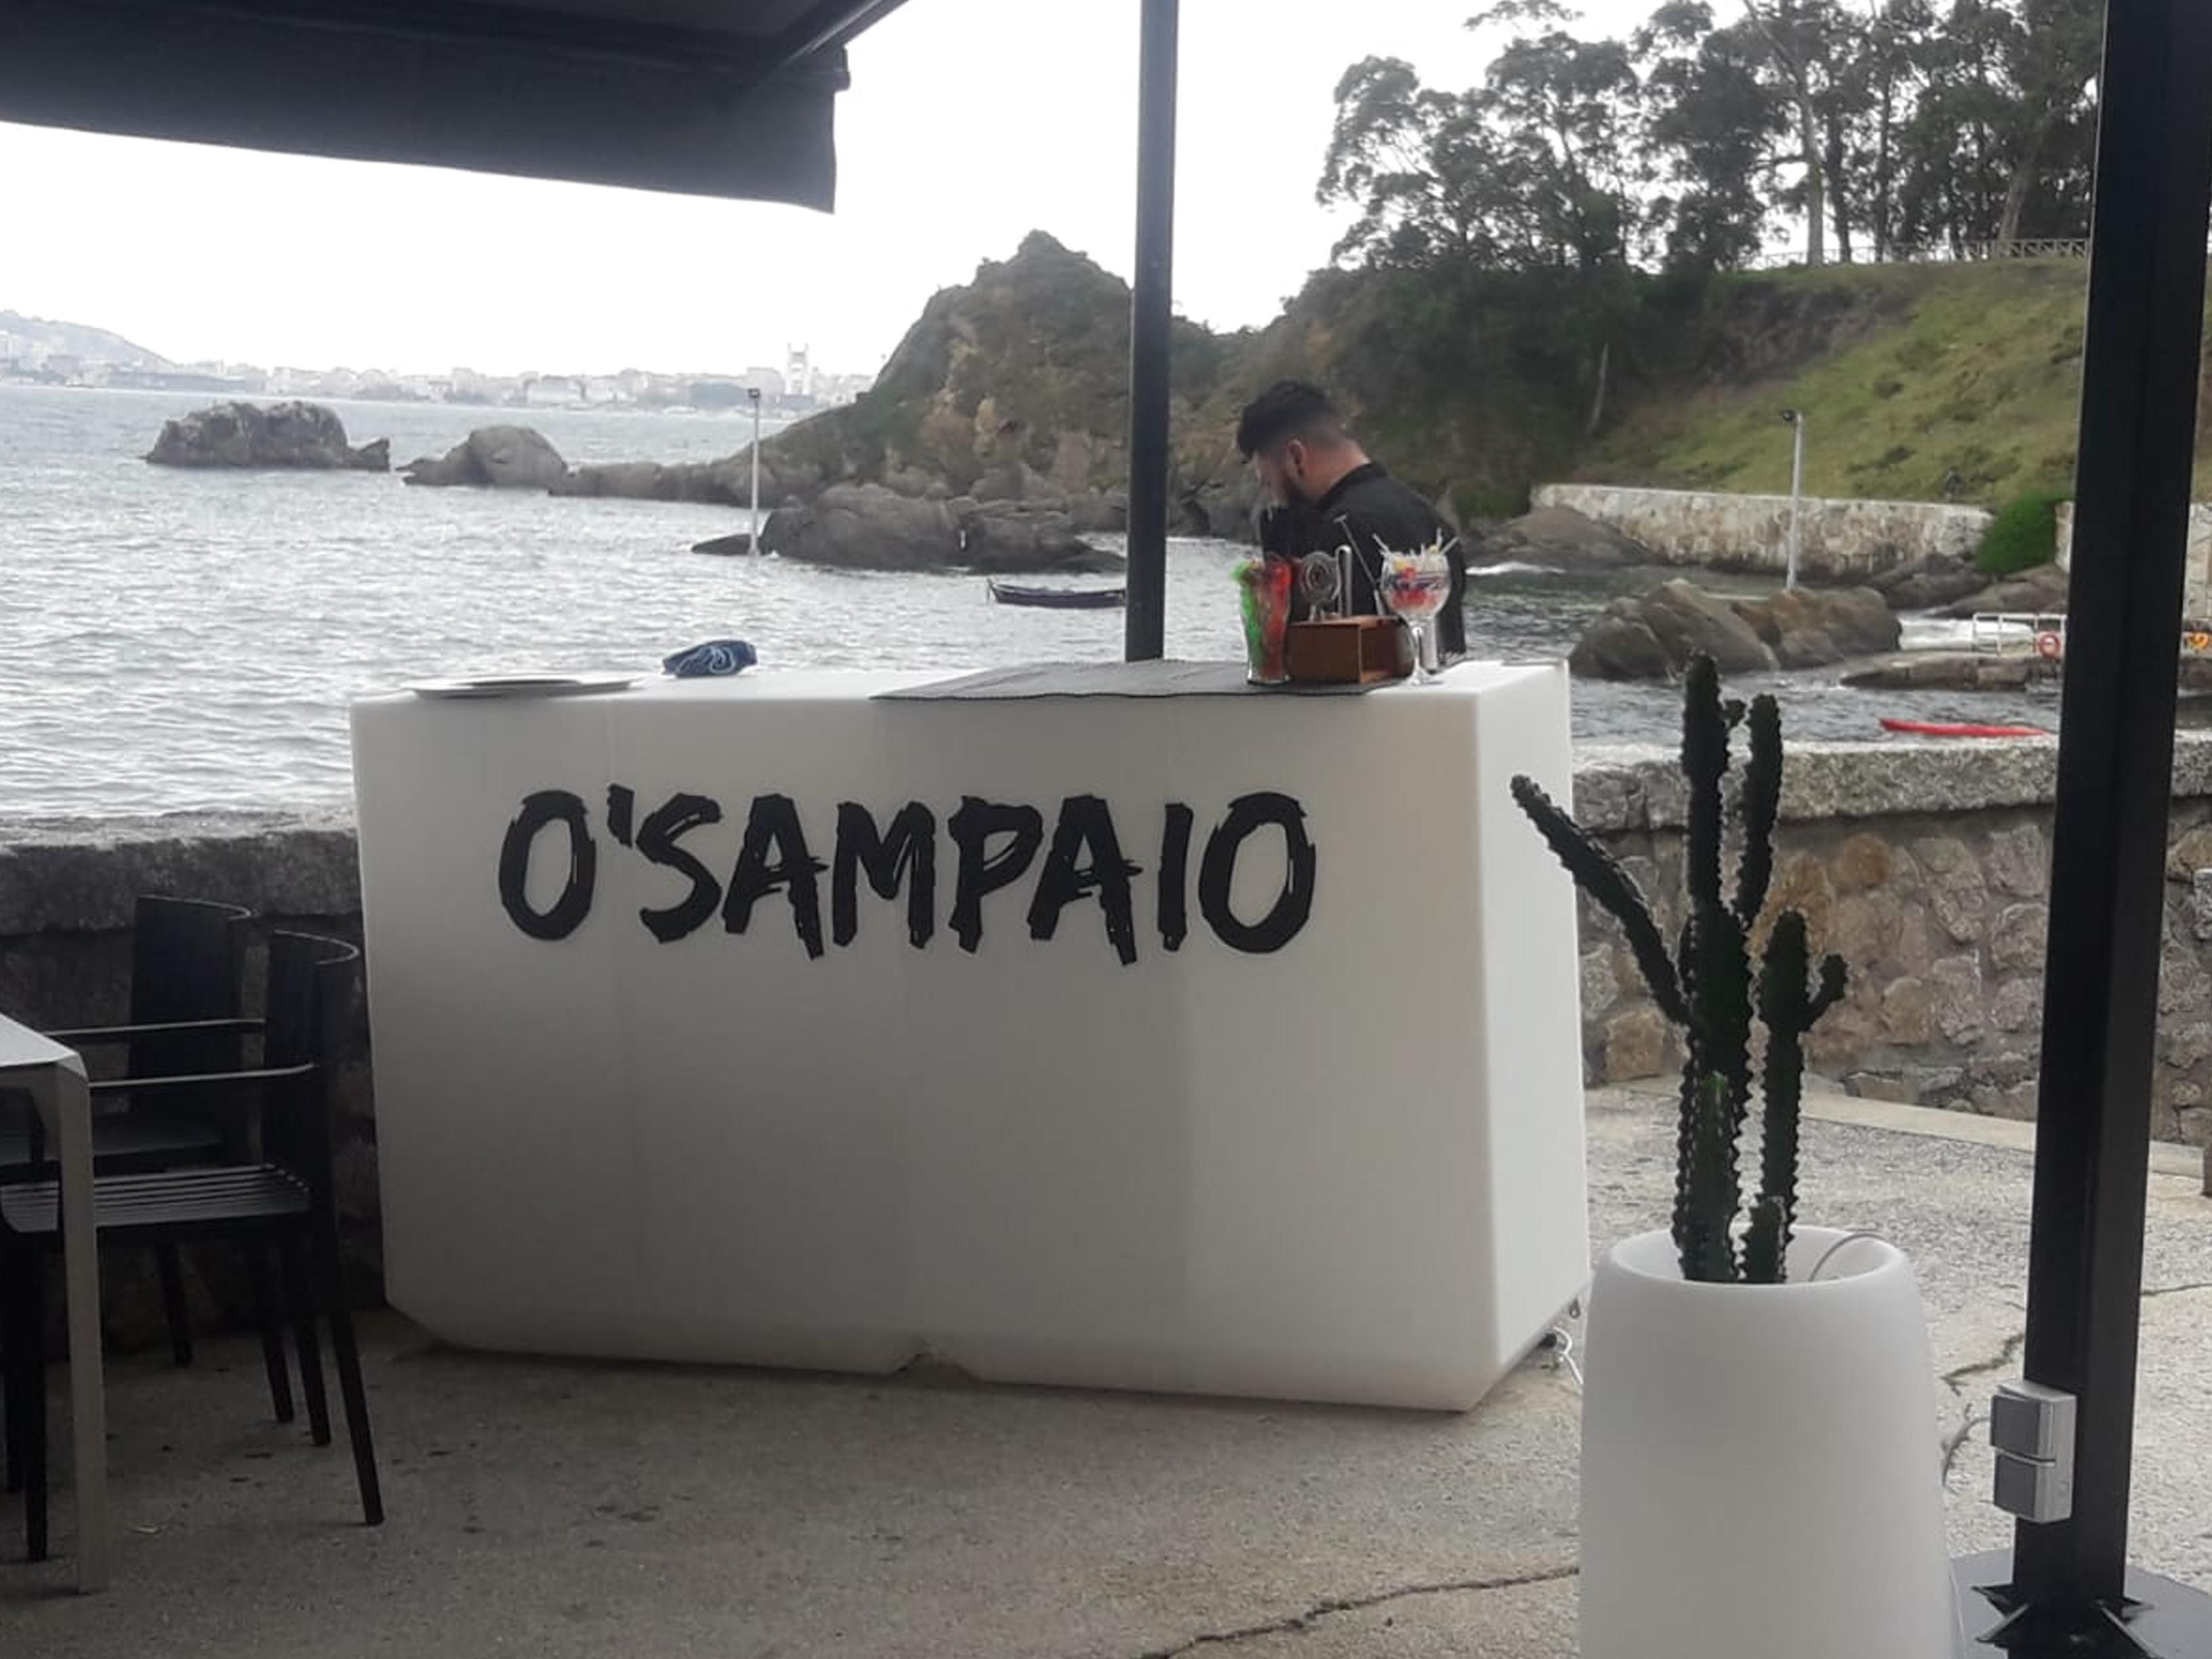 http://luzcoruna.es/wp-content/uploads/2020/03/OSampaio-Sta.-Cruz-3.jpg